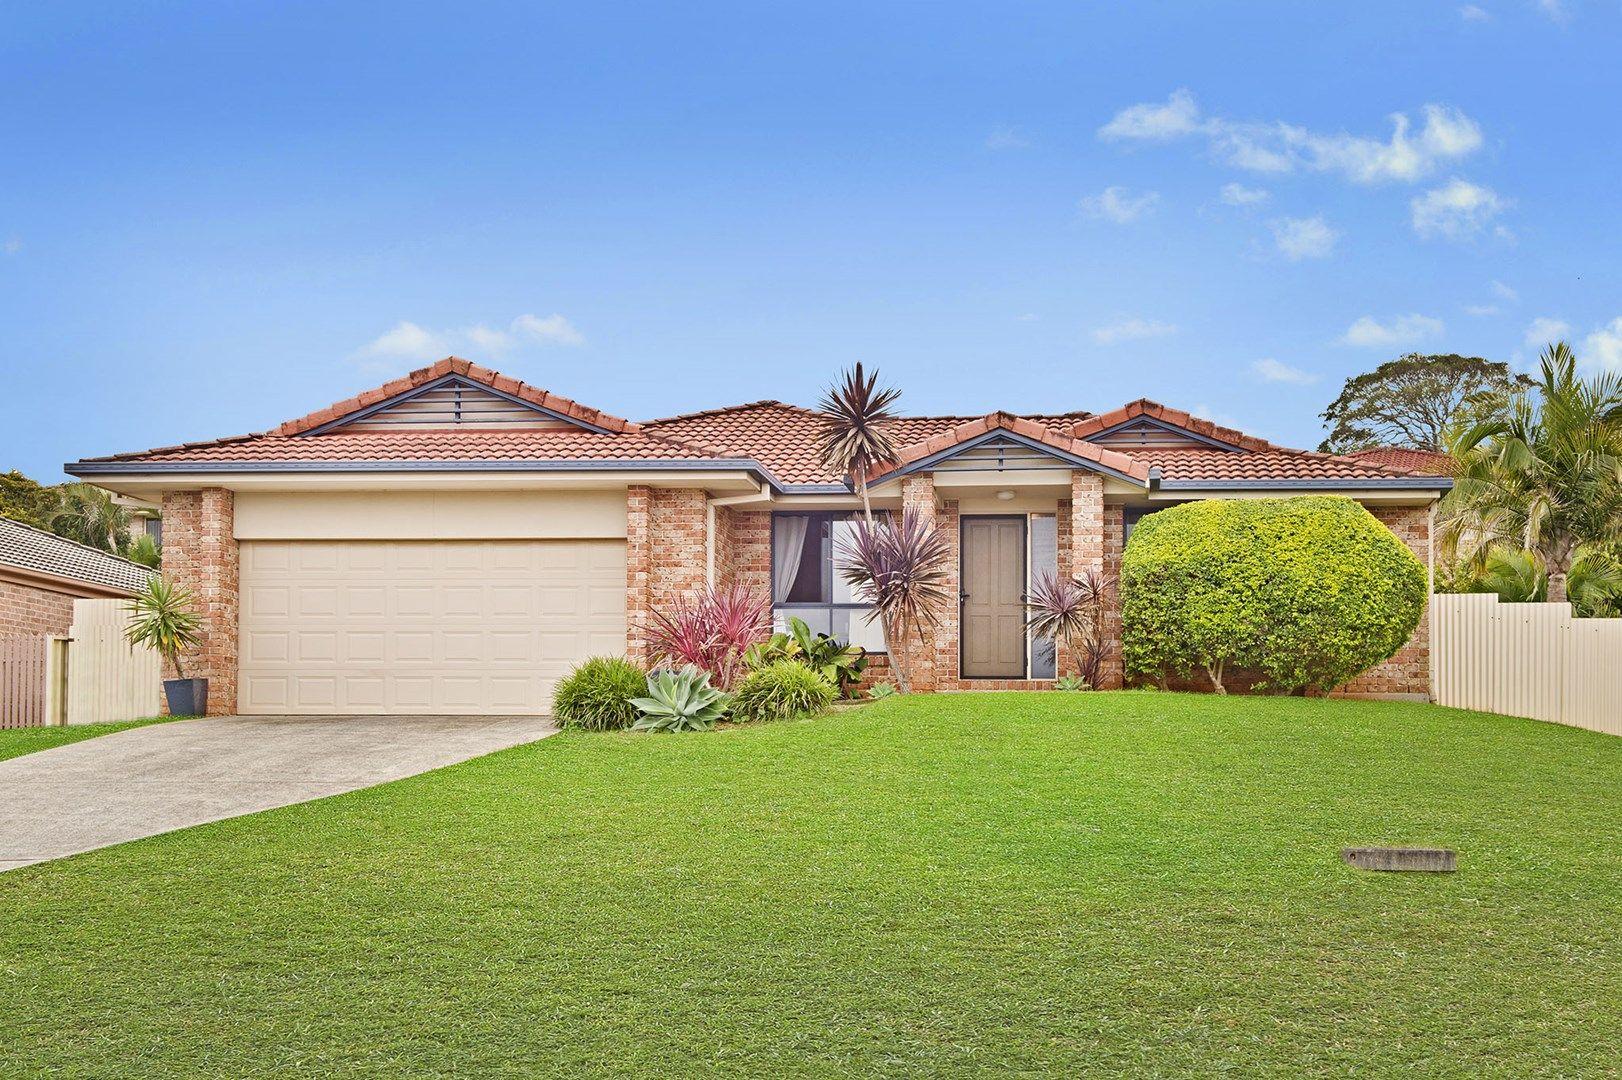 53 Brindabella Way, Port Macquarie NSW 2444, Image 0